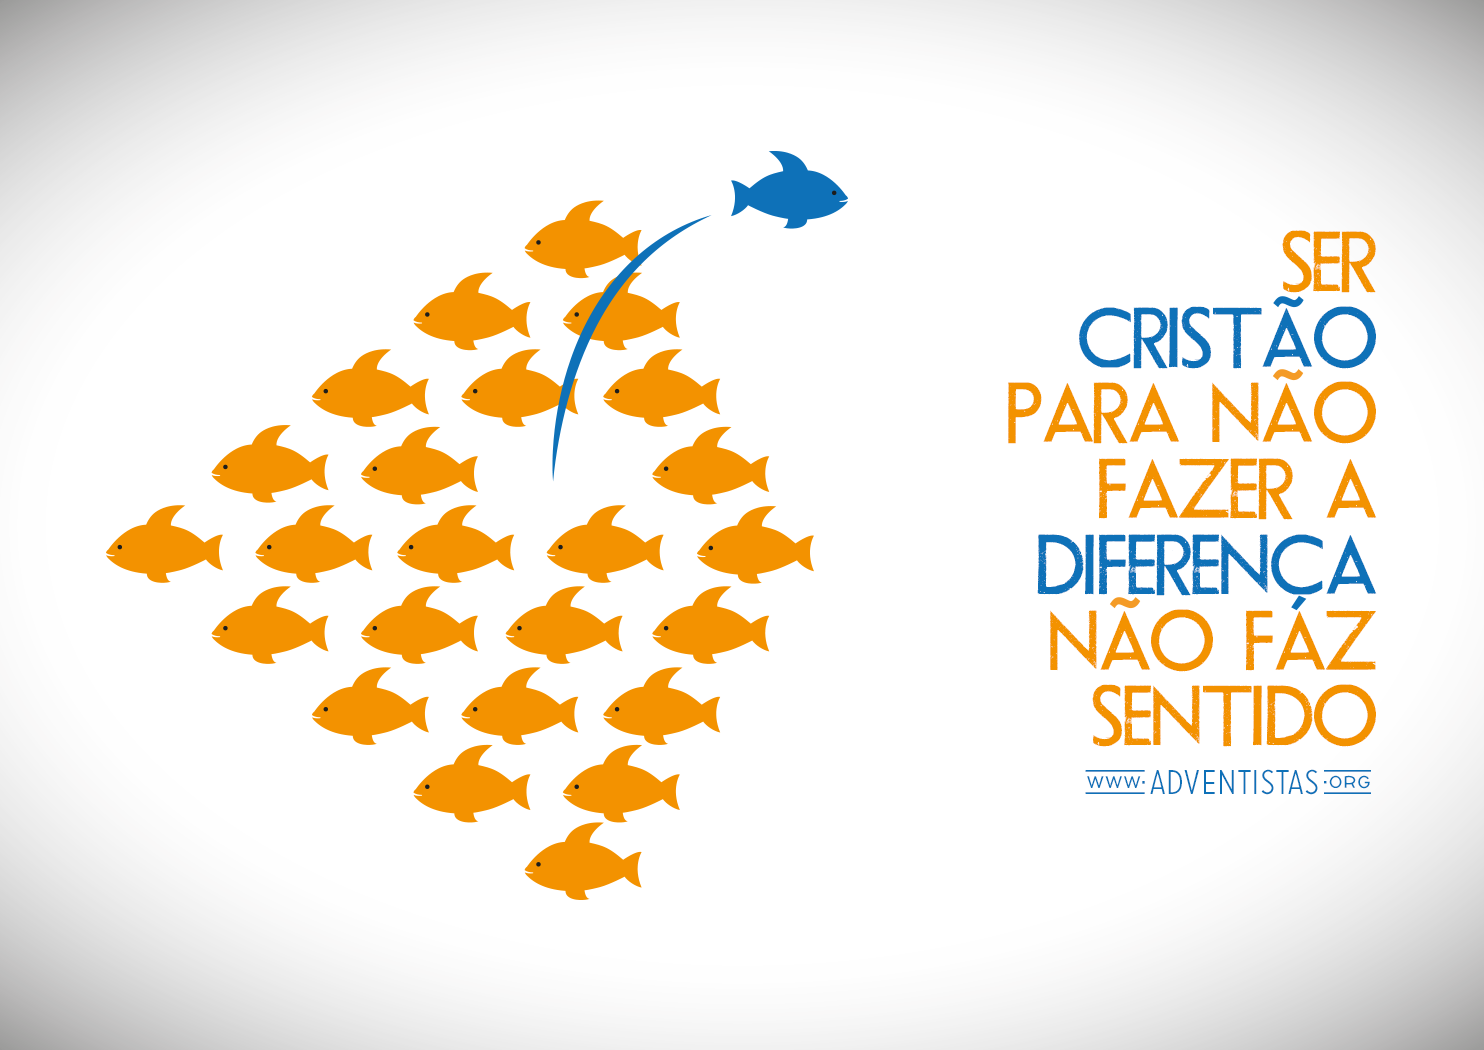 site_ser-cristao-diferenca